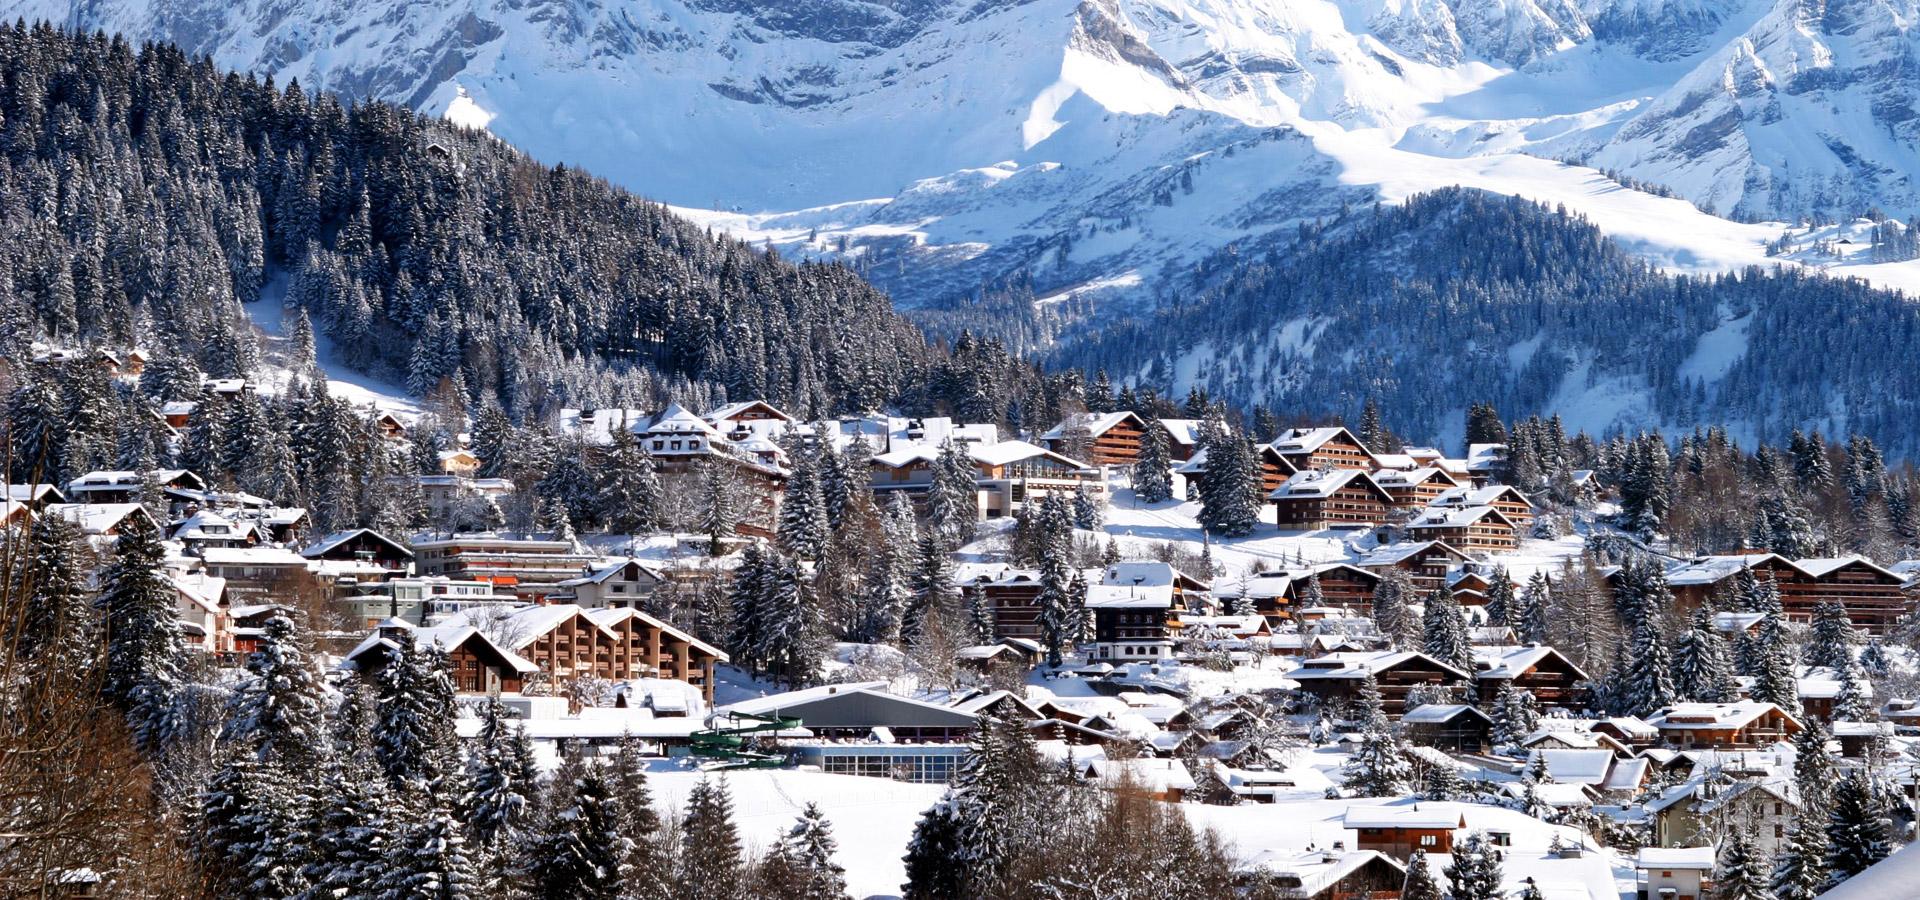 Switzerland: Some of the Best Ski Resorts in Europe - News